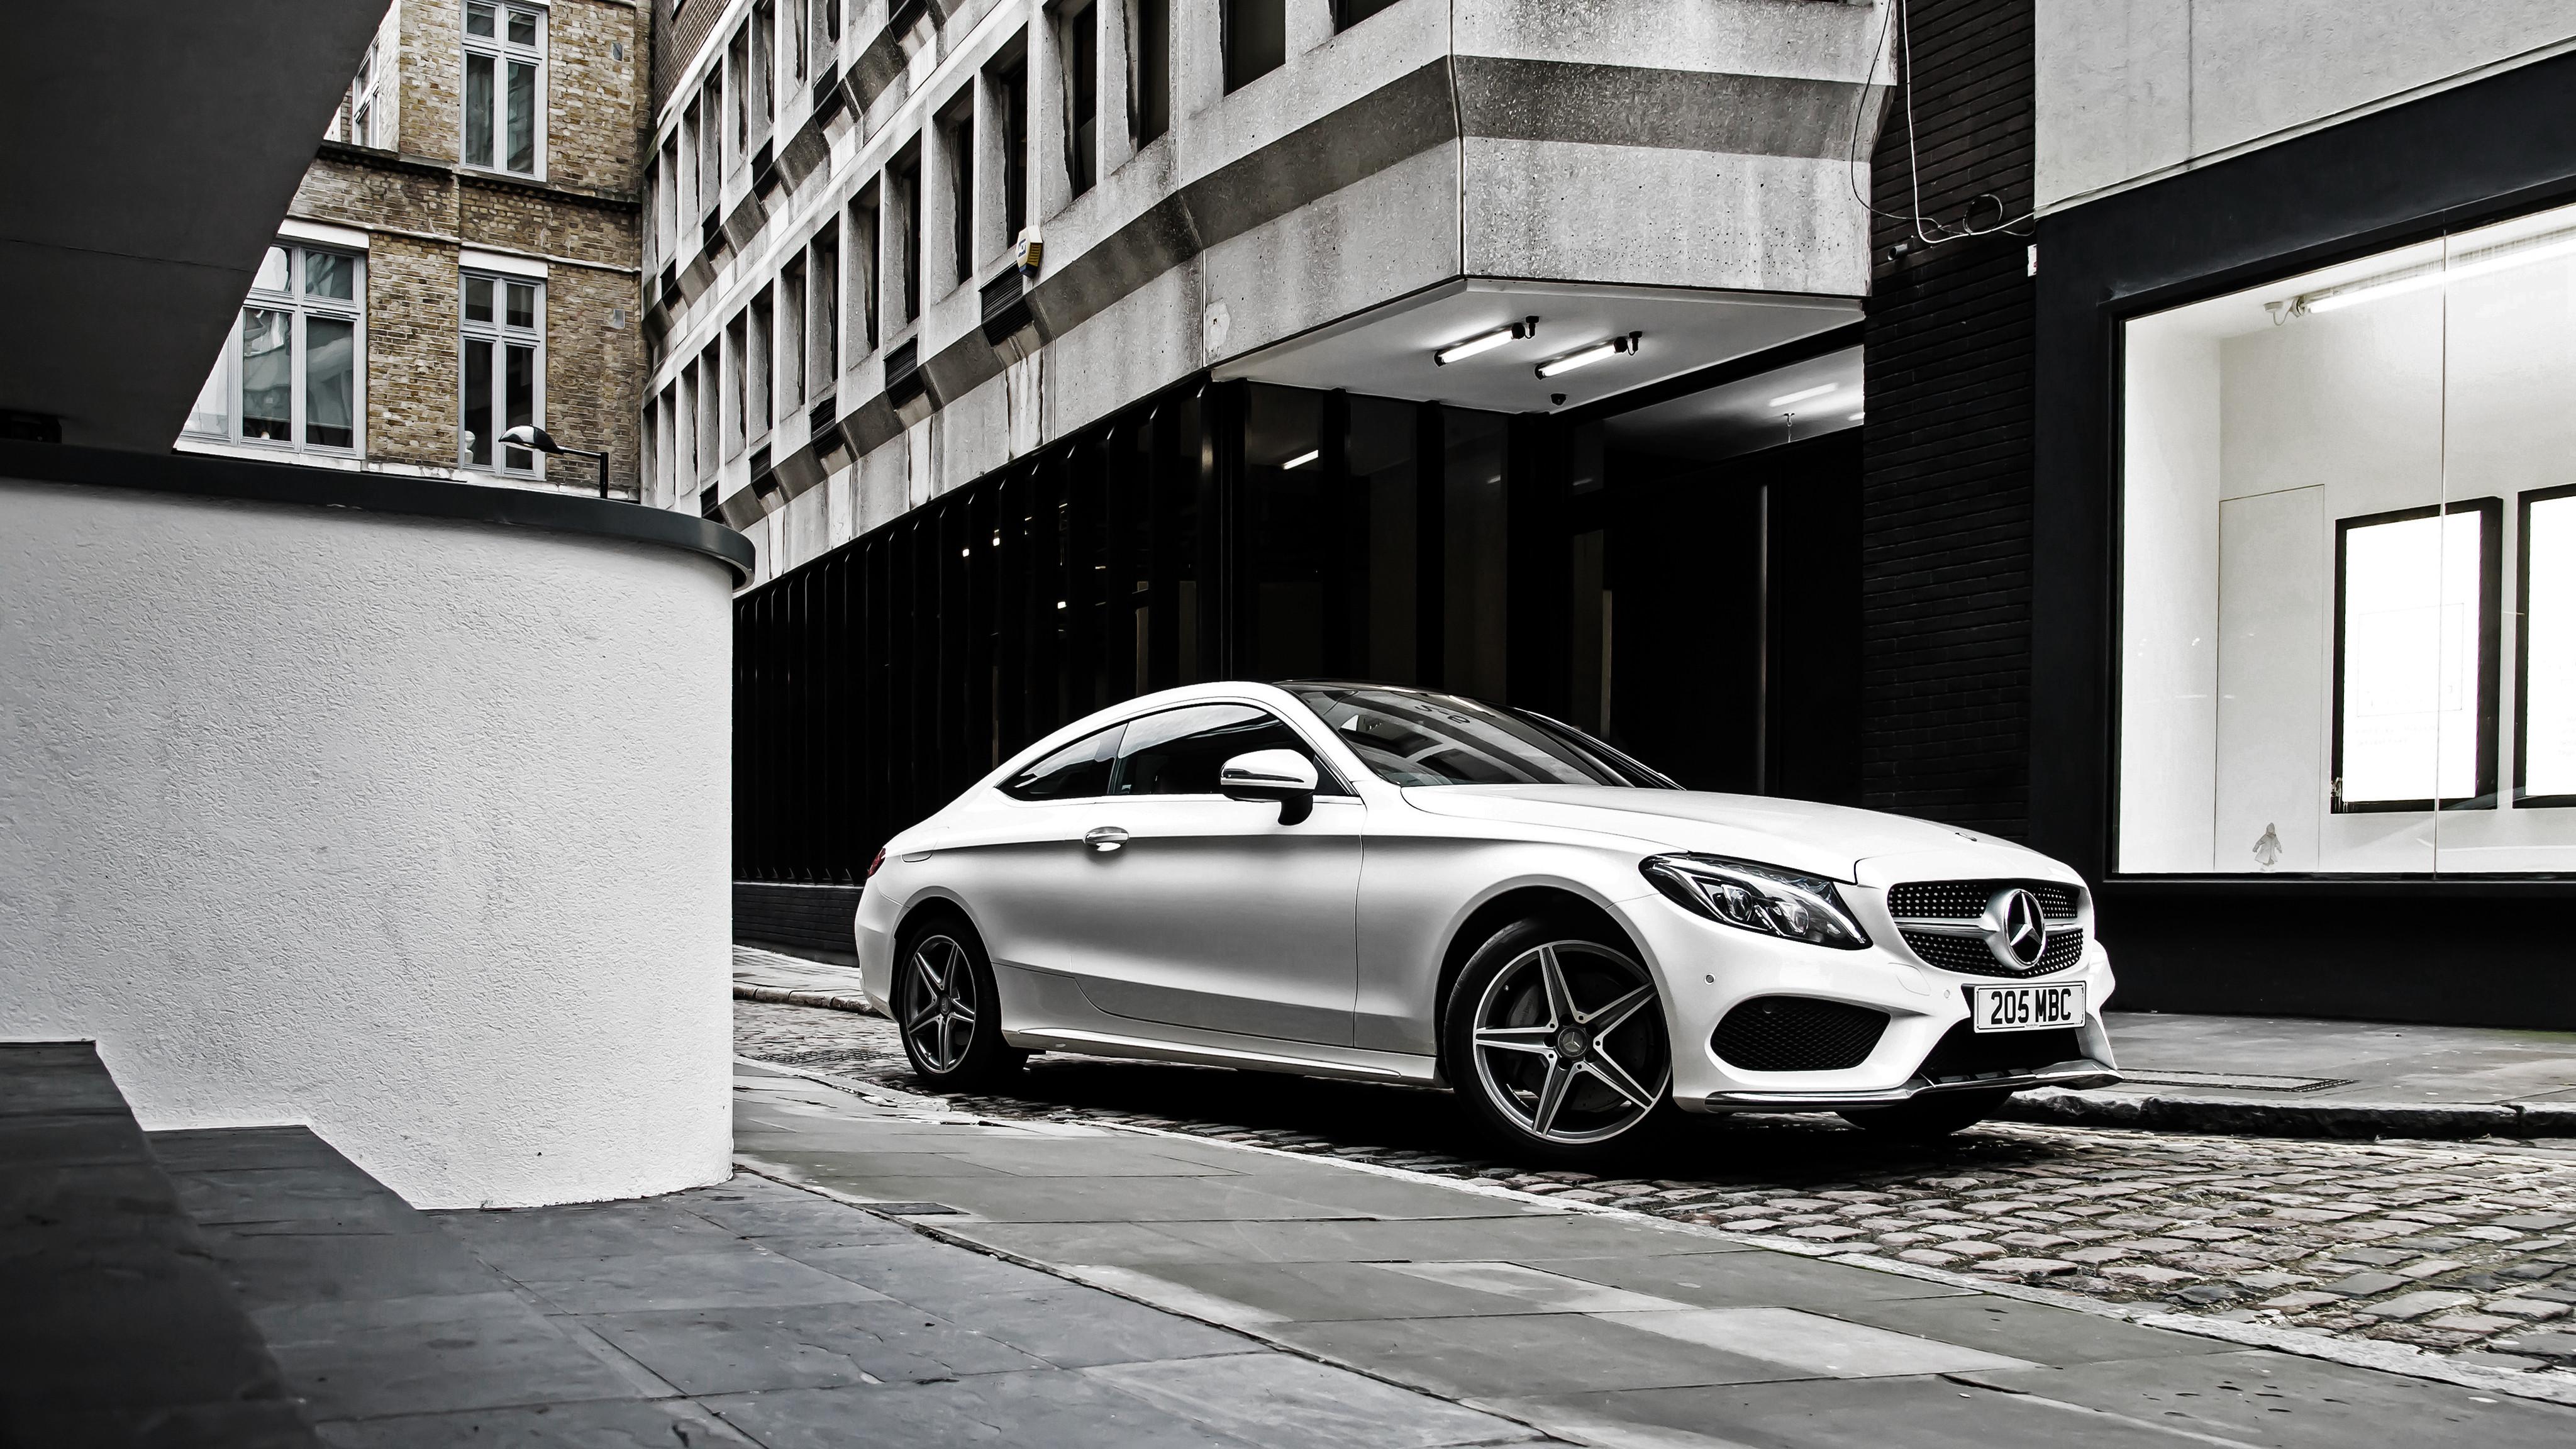 Mercedes Benz C Class, HD Cars, 4k Wallpapers, Images